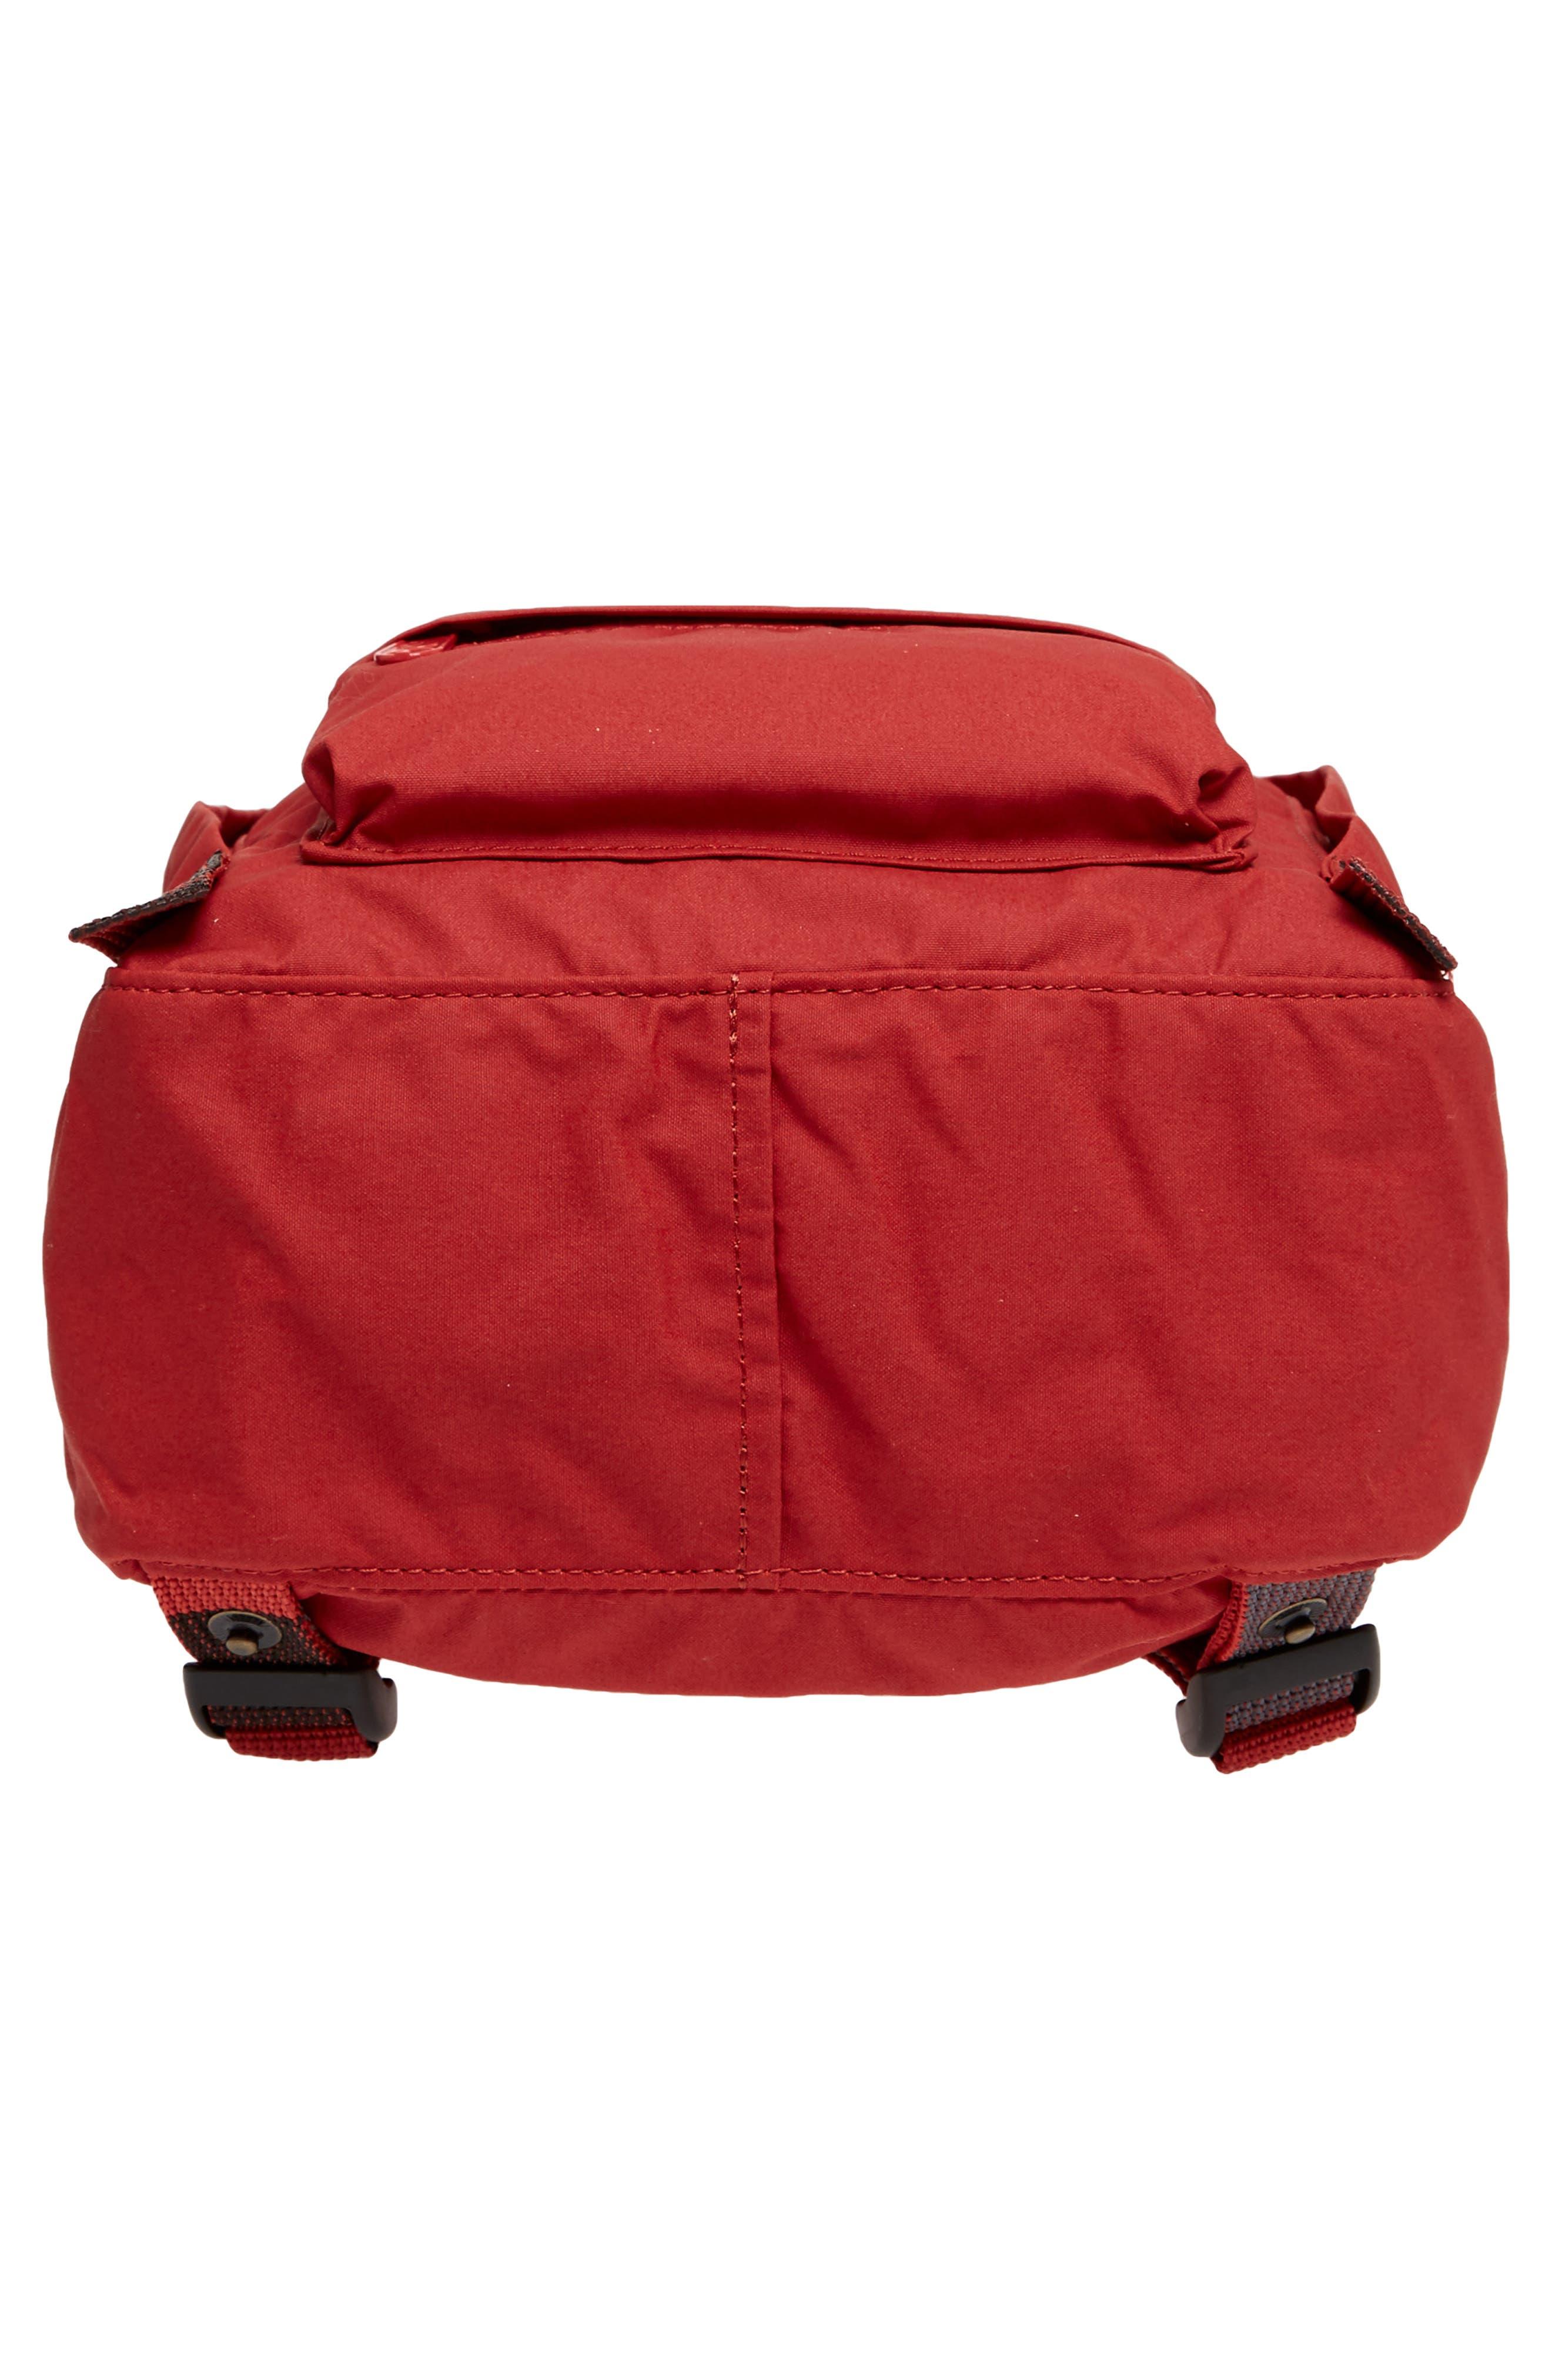 'Mini Kånken' Water Resistant Backpack,                             Alternate thumbnail 5, color,                             Deep Red Blocked